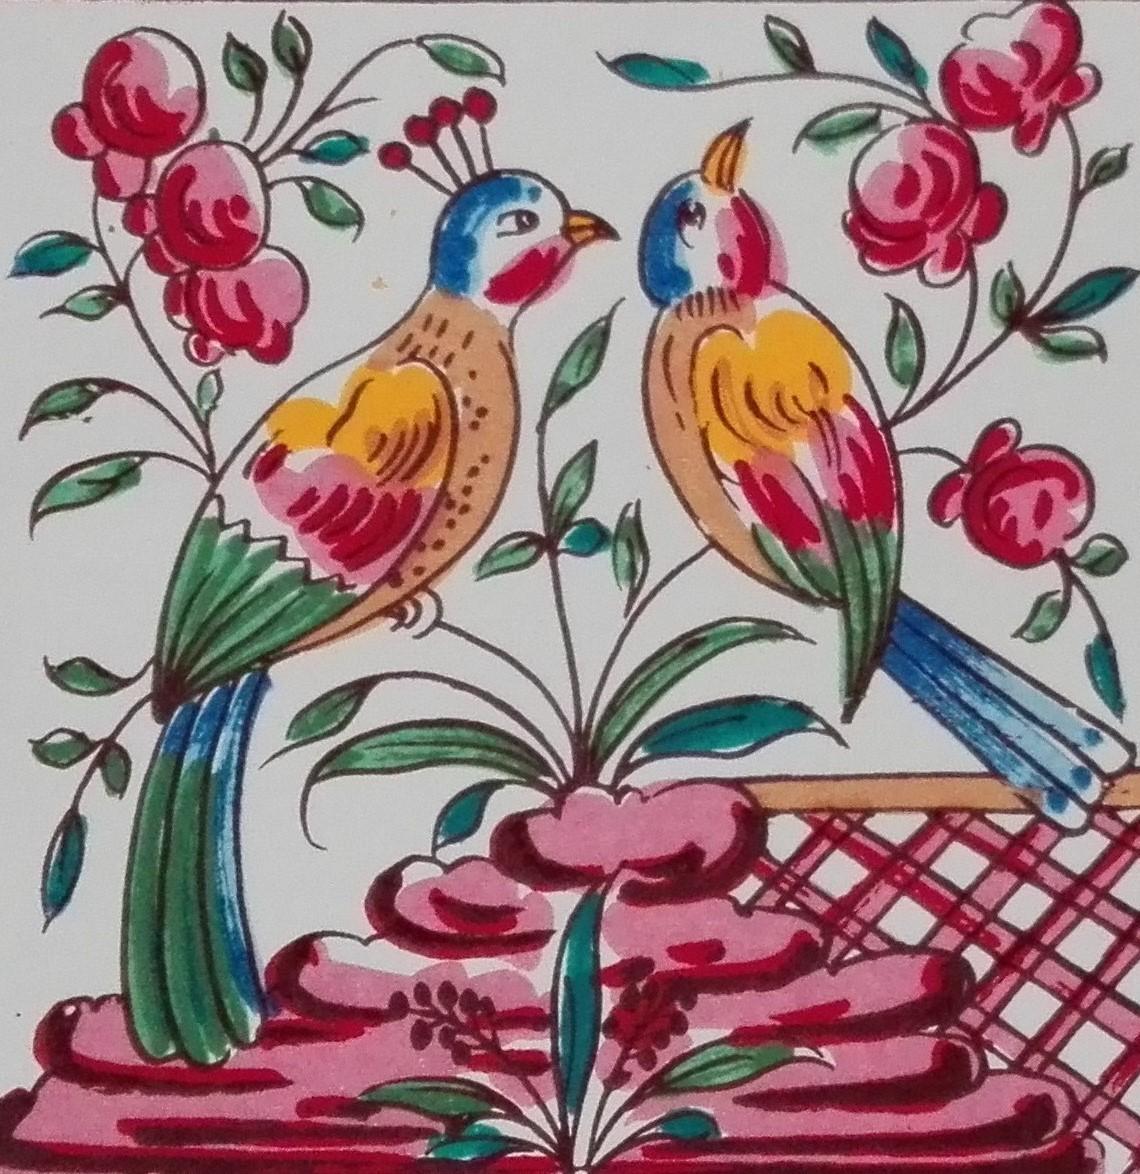 Pássaros Cores 11x11